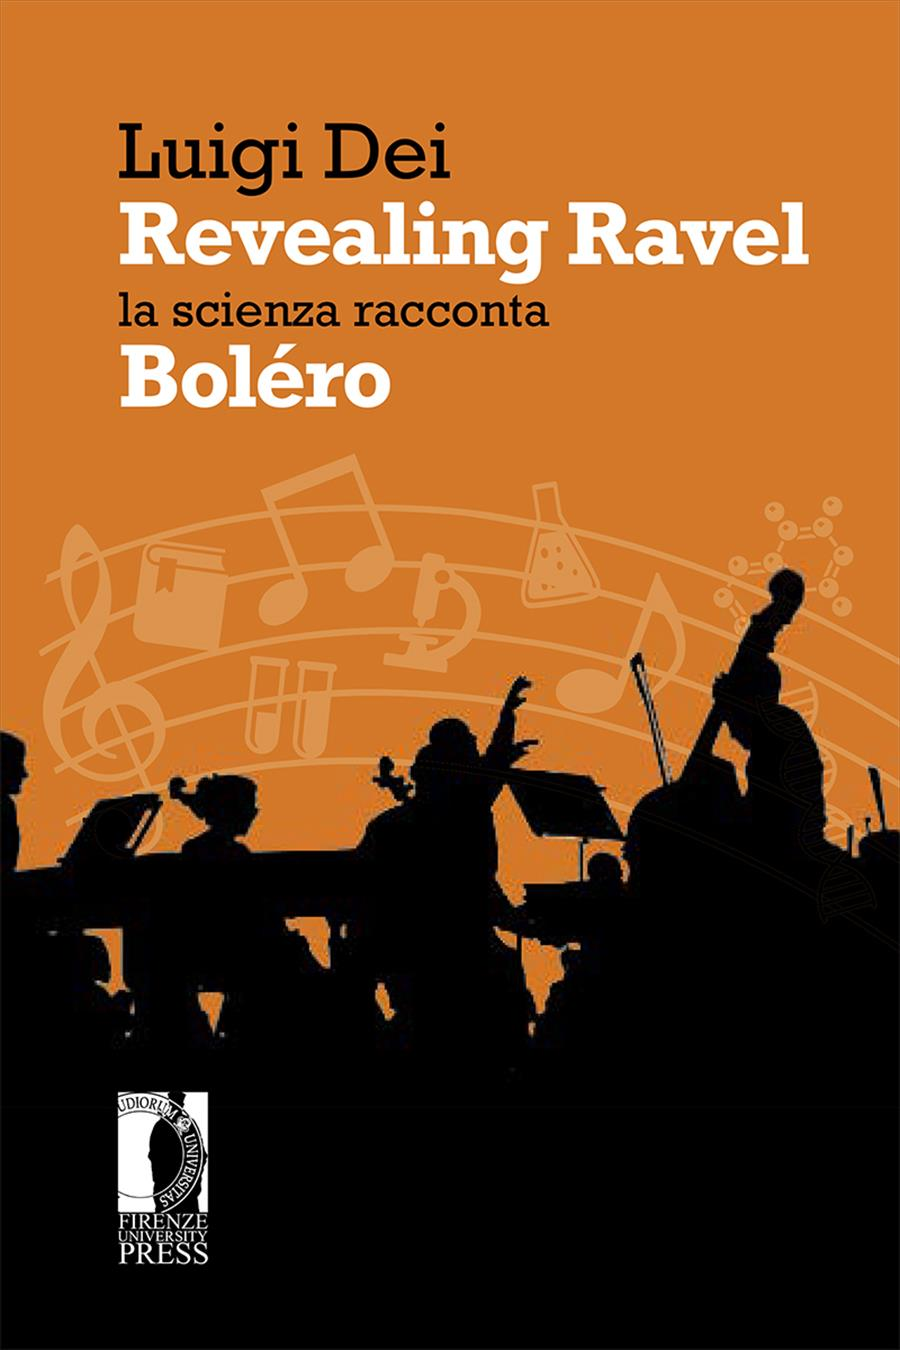 Revealing Ravel: la scienza racconta Boléro